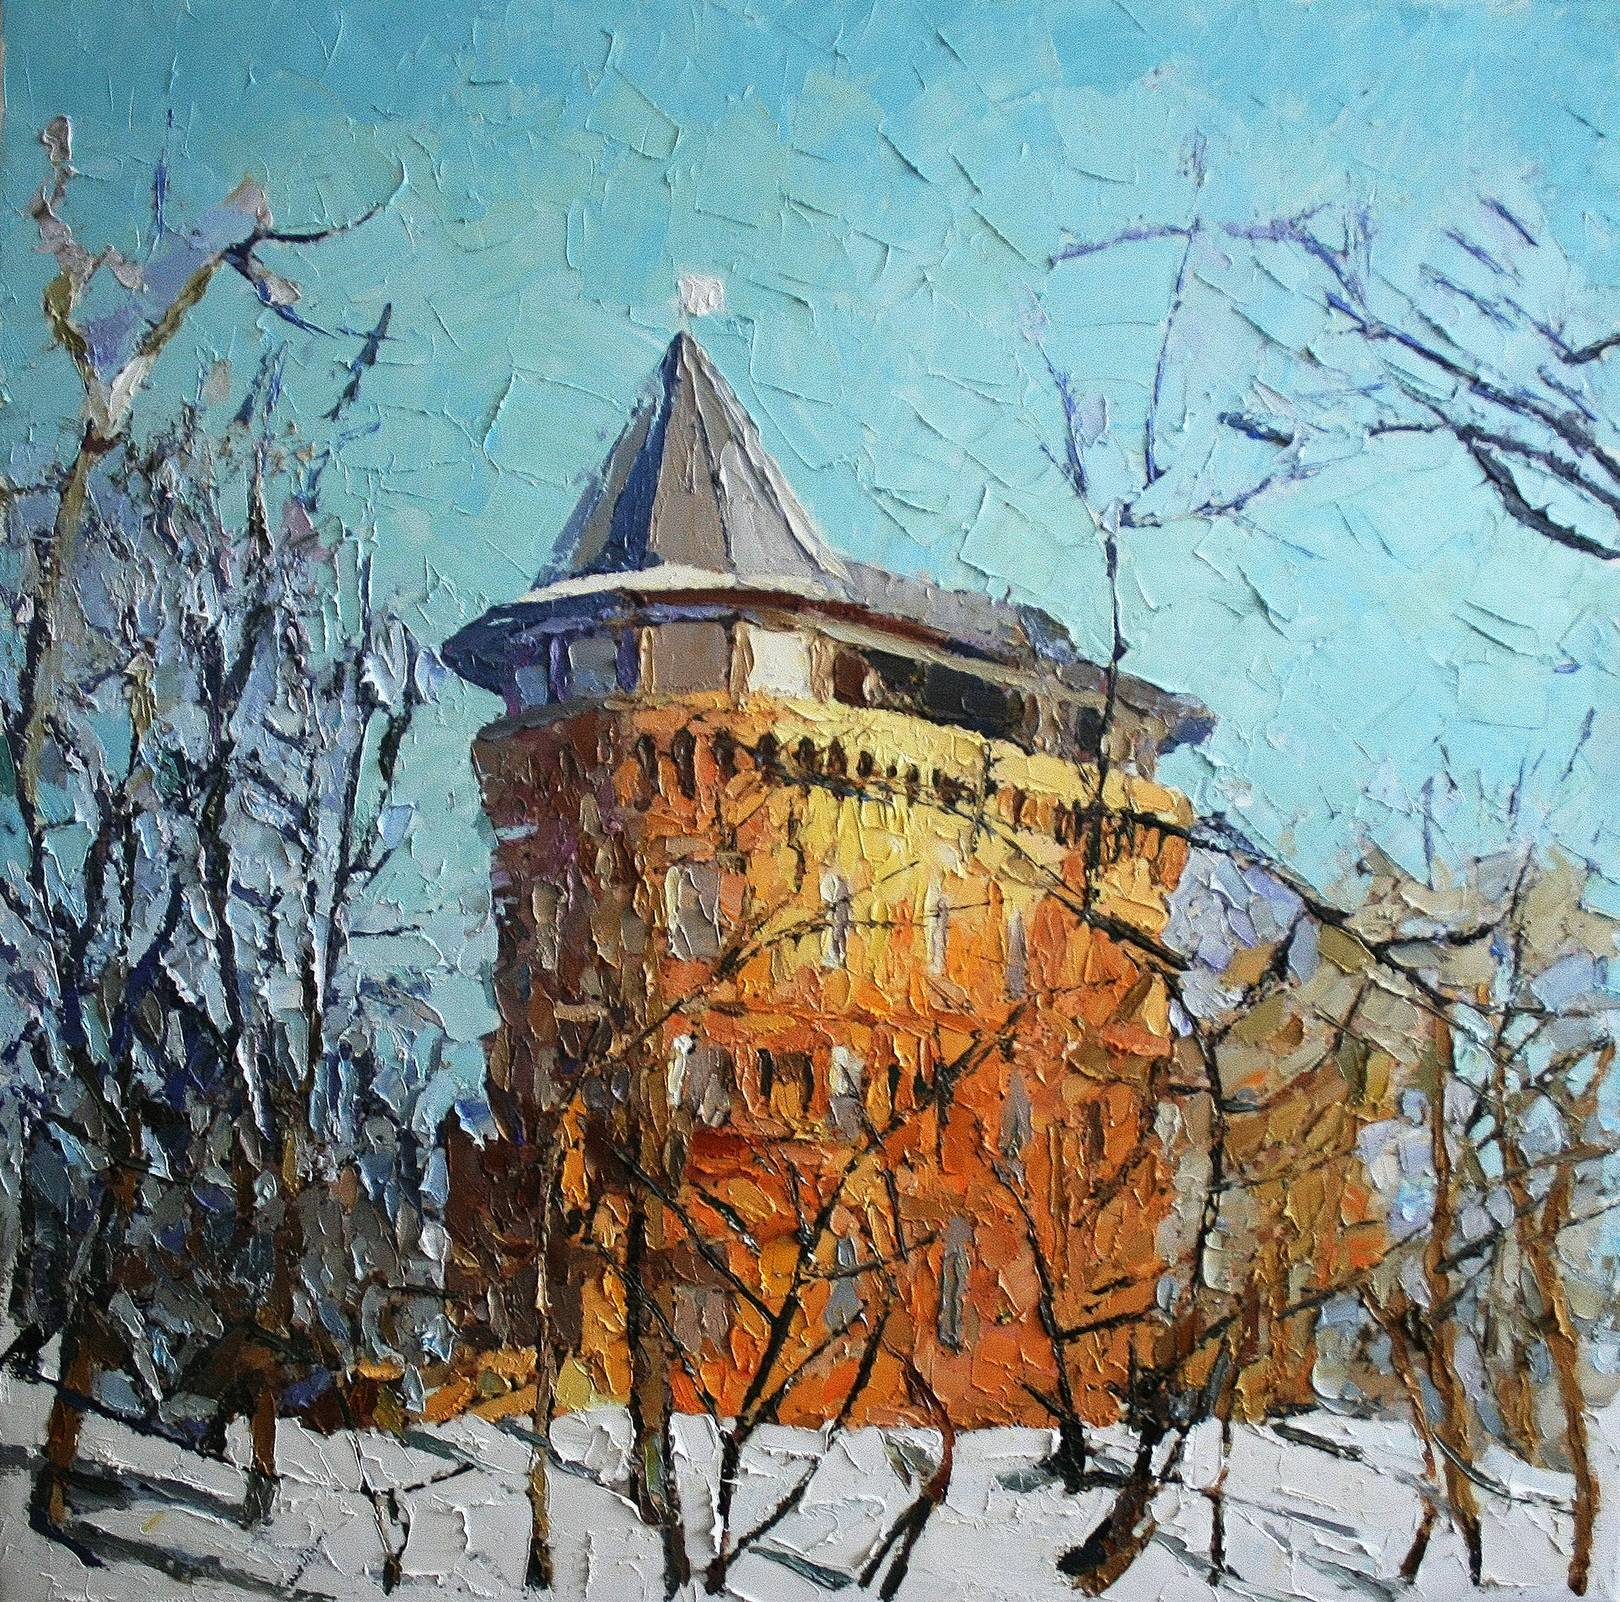 1285.«Башня зимой» холст, масло, 55х55 см, 2020